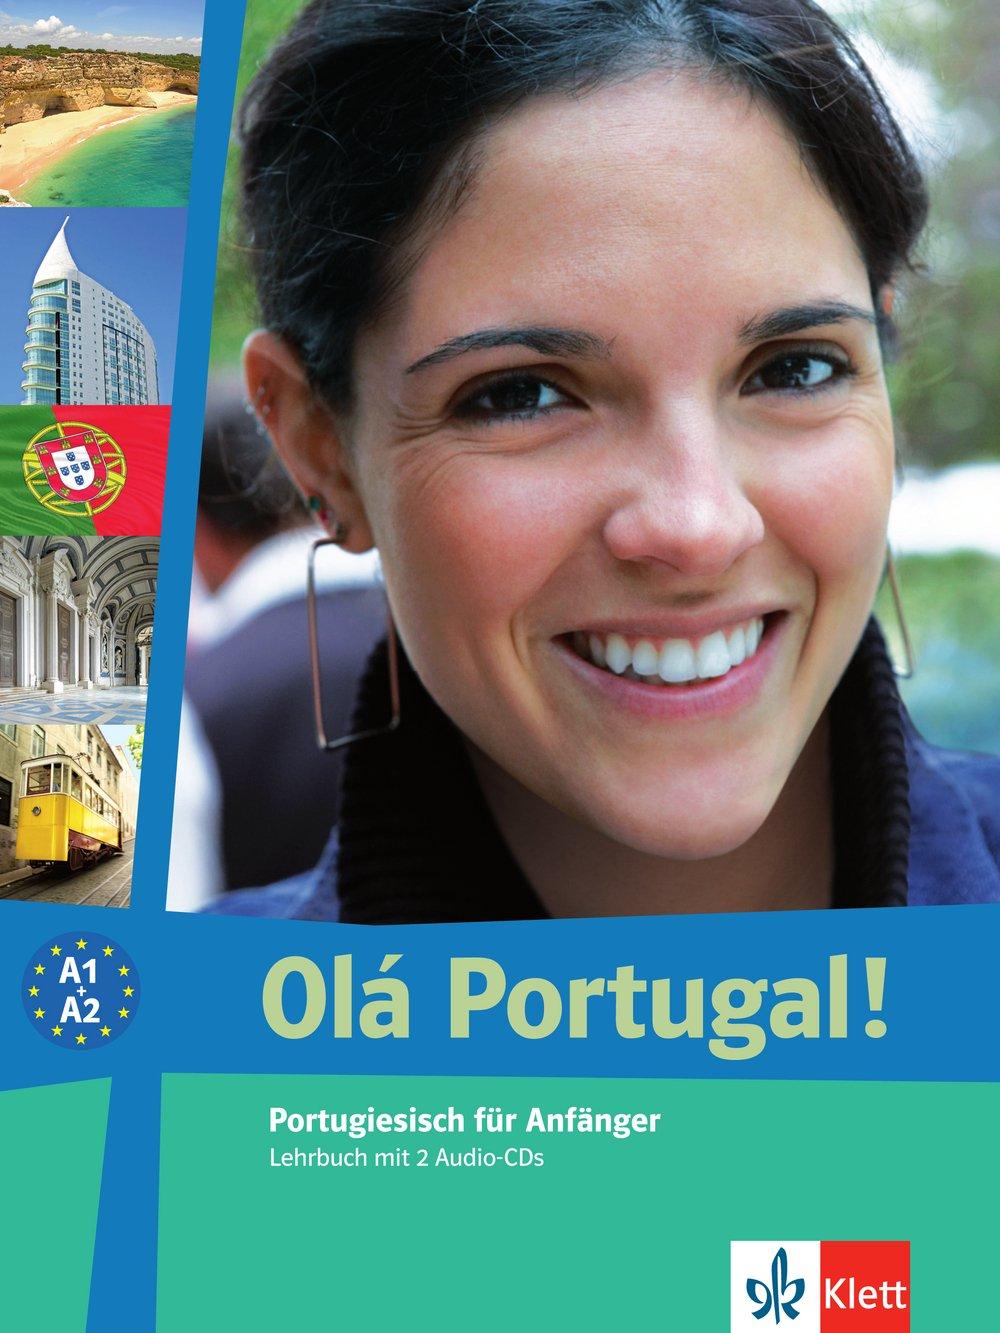 Olá Portugal  A1 A2  Portugiesisch Für Anfänger. Lehrbuch + 2 Audio CDs  Olá Portugal  Neu   Portugiesisch Für Anfänger